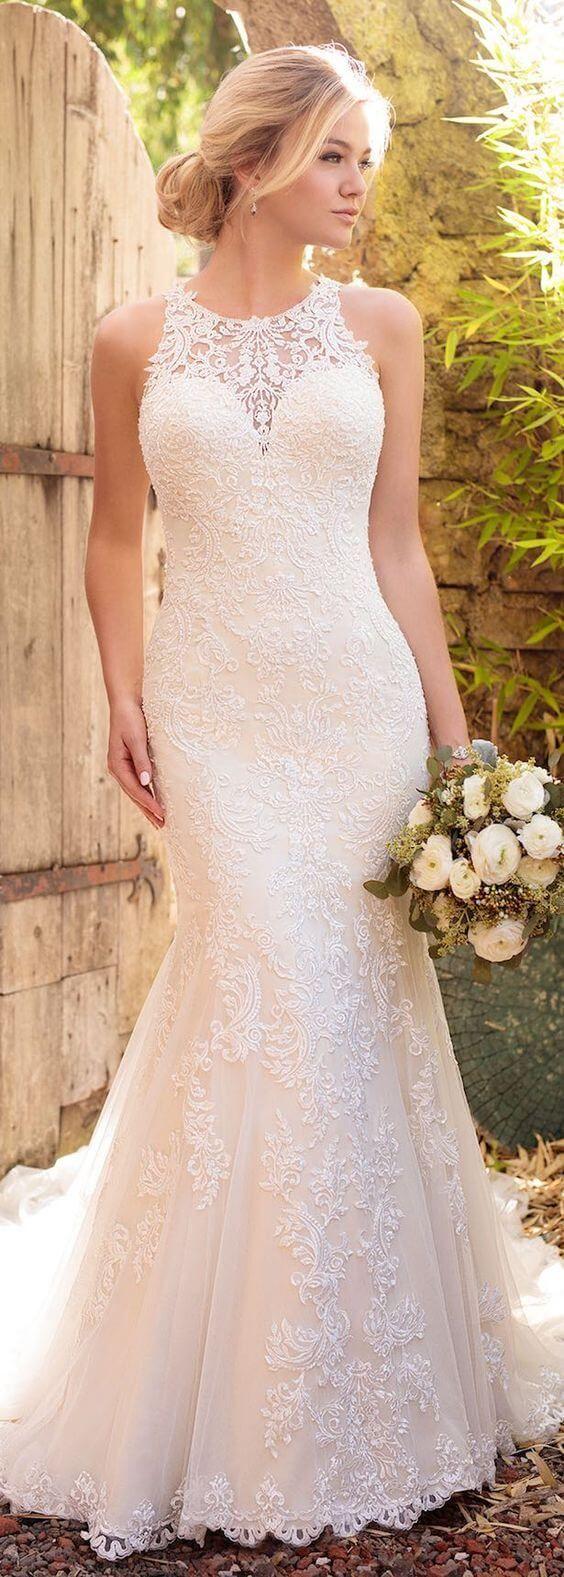 The 25 best Amazing wedding dress ideas on Pinterest Princess